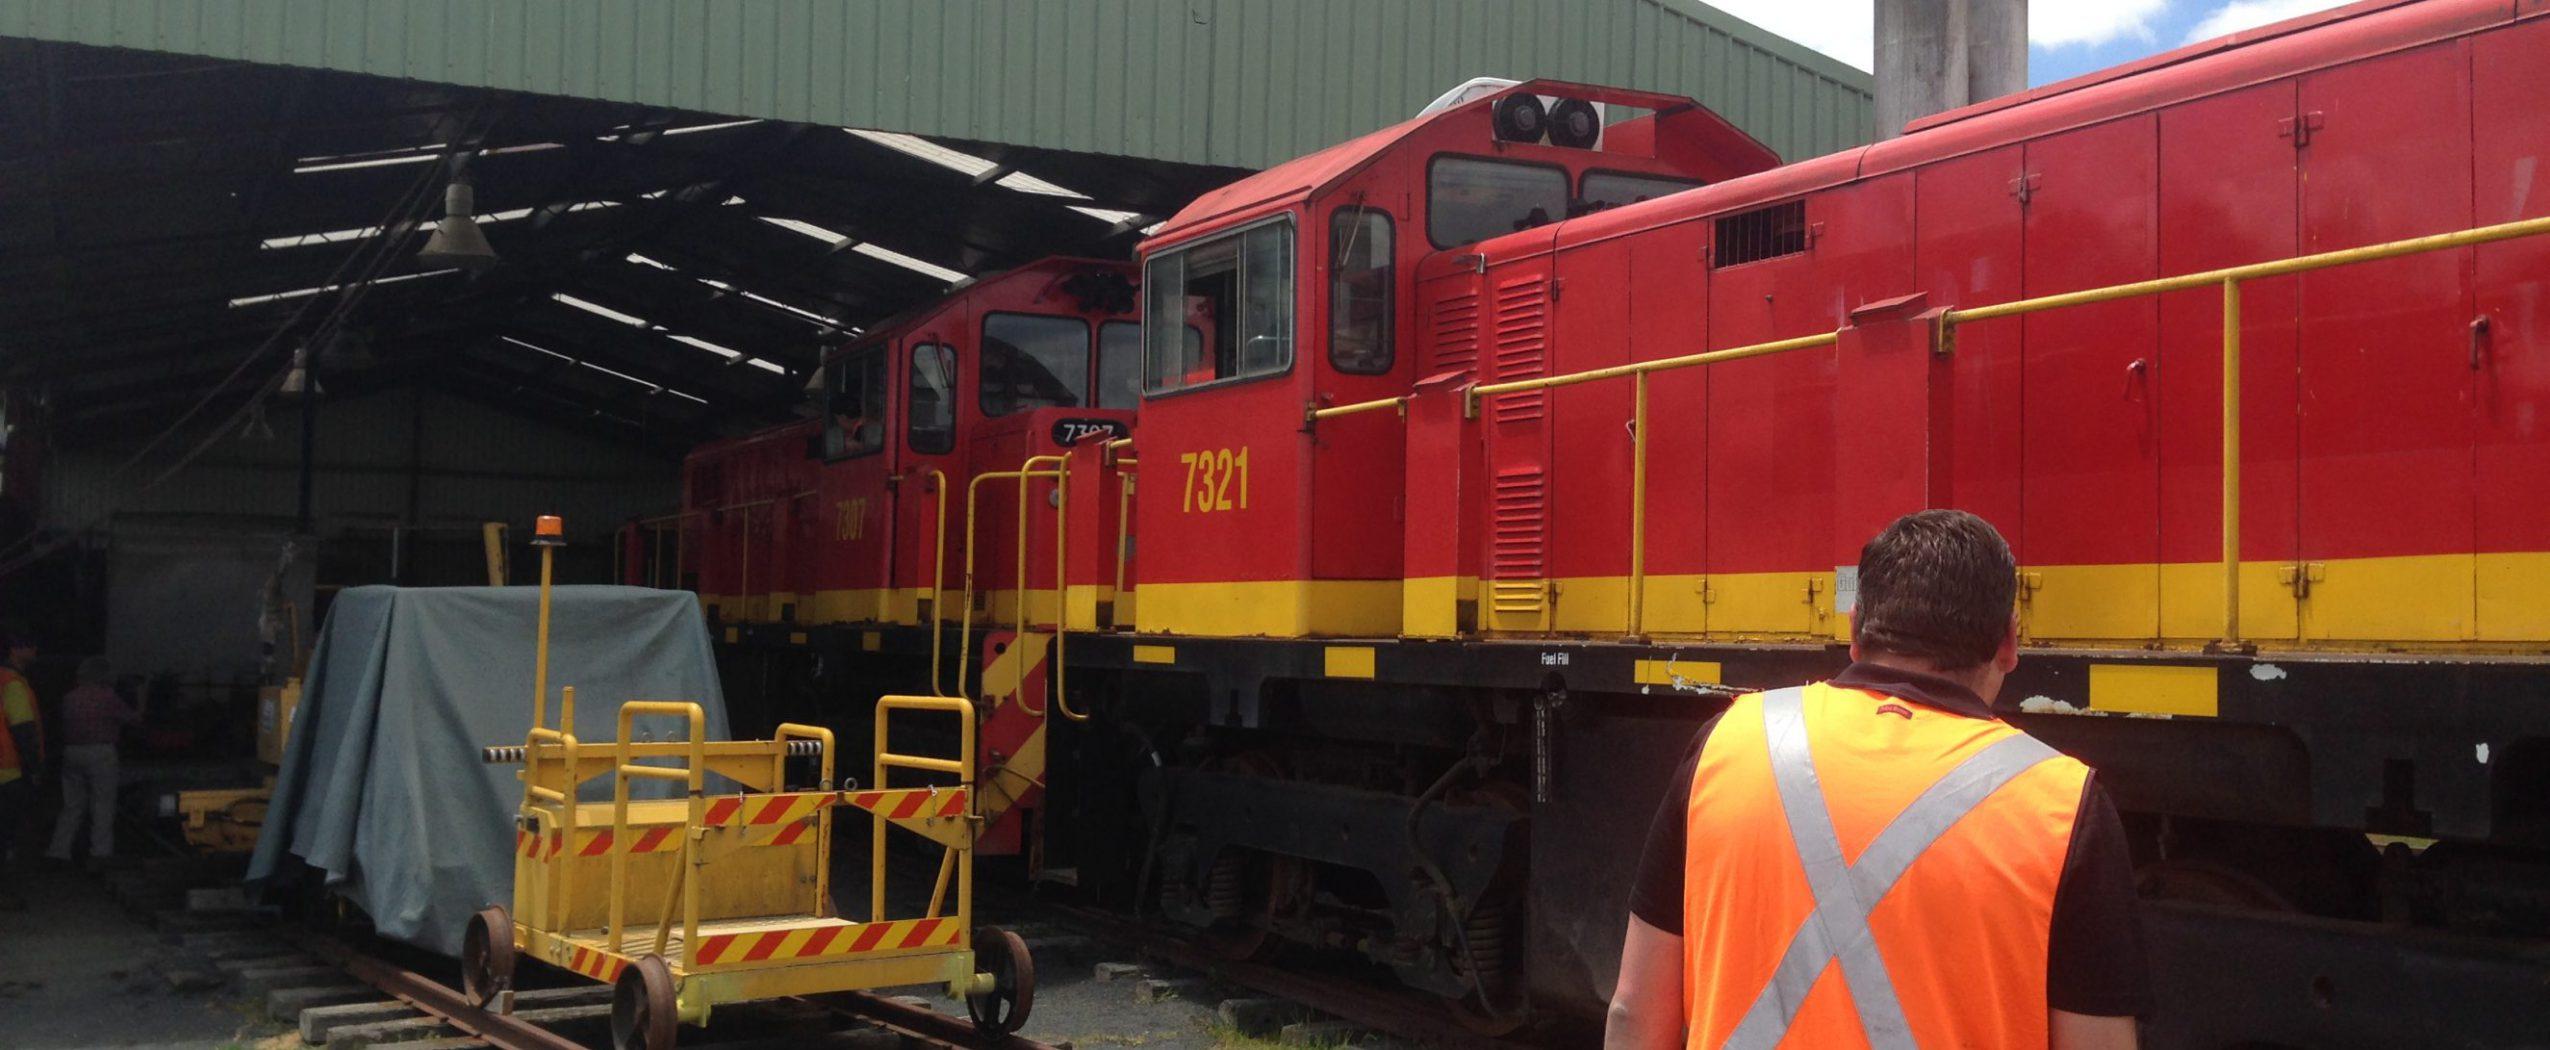 Home Oberon Tarana Heritage Railway 1